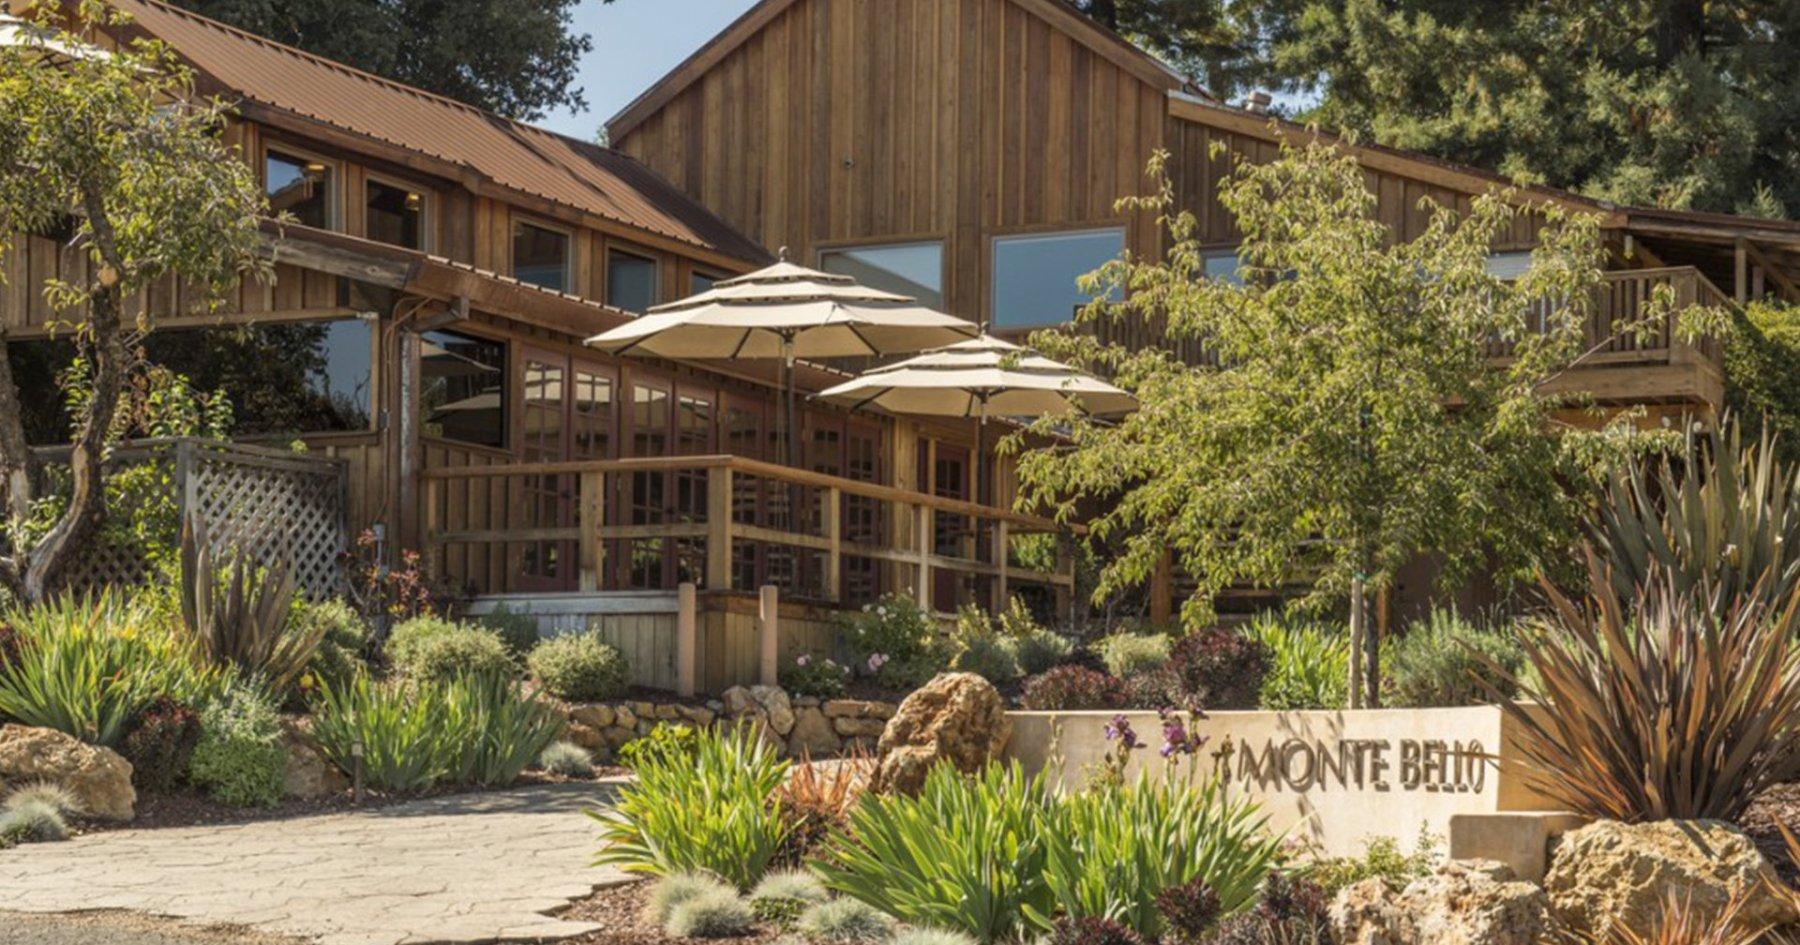 4-Hour Rule: Santa Cruz Mountains